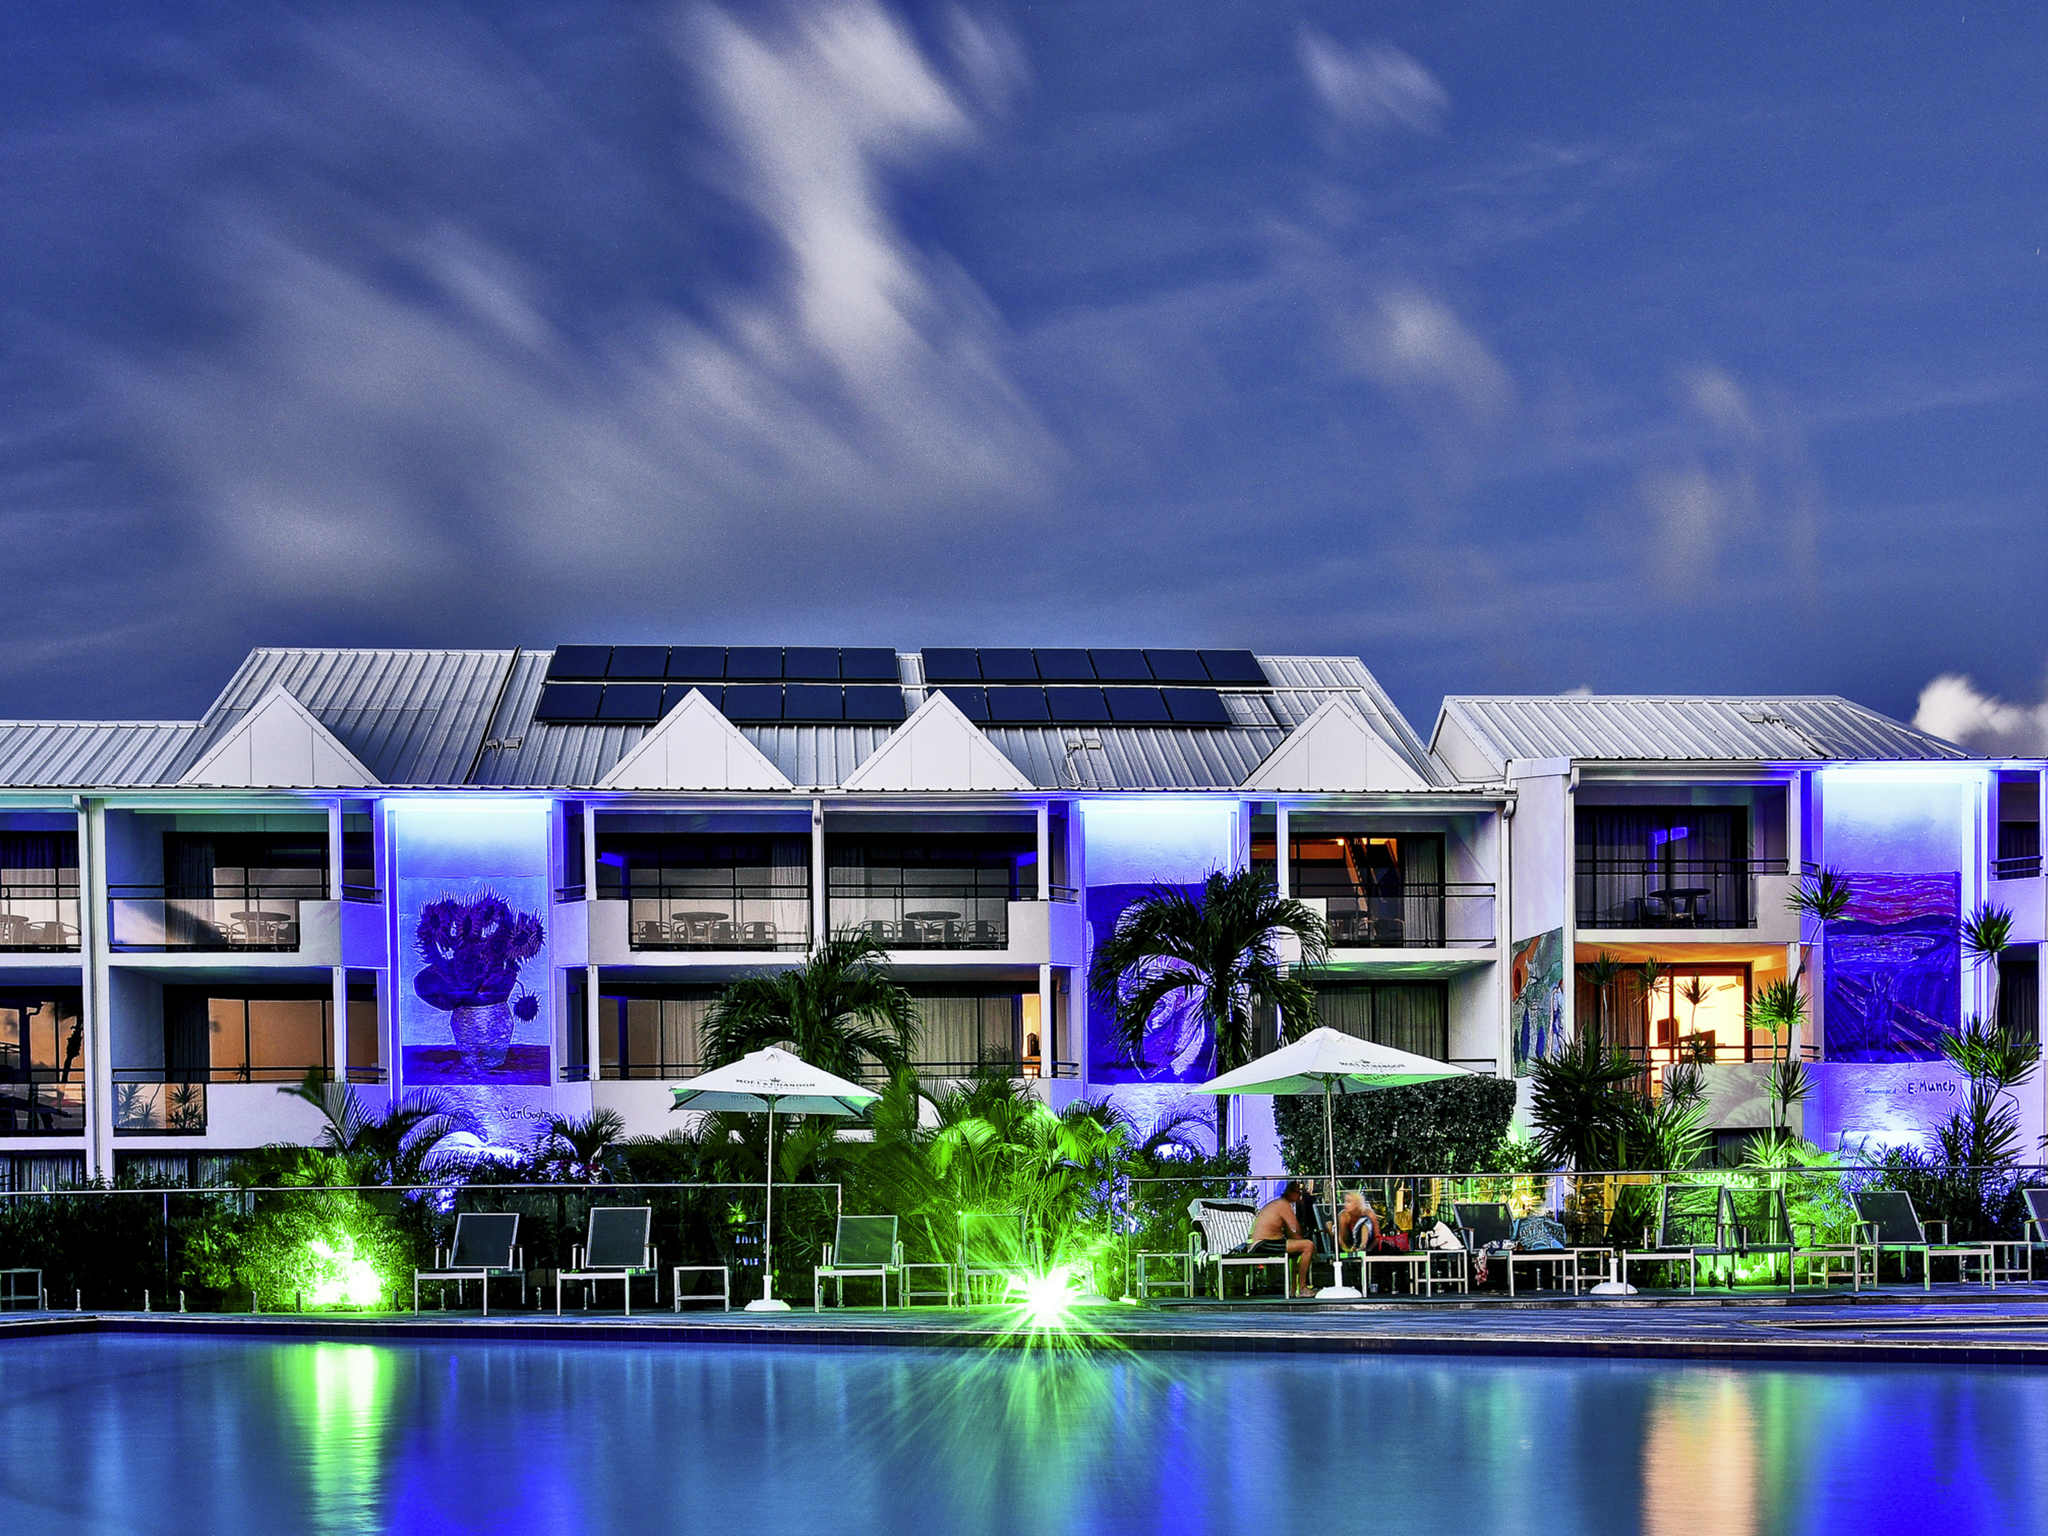 Hotel – Hotel Mercure Saint-Martin Marina and Spa